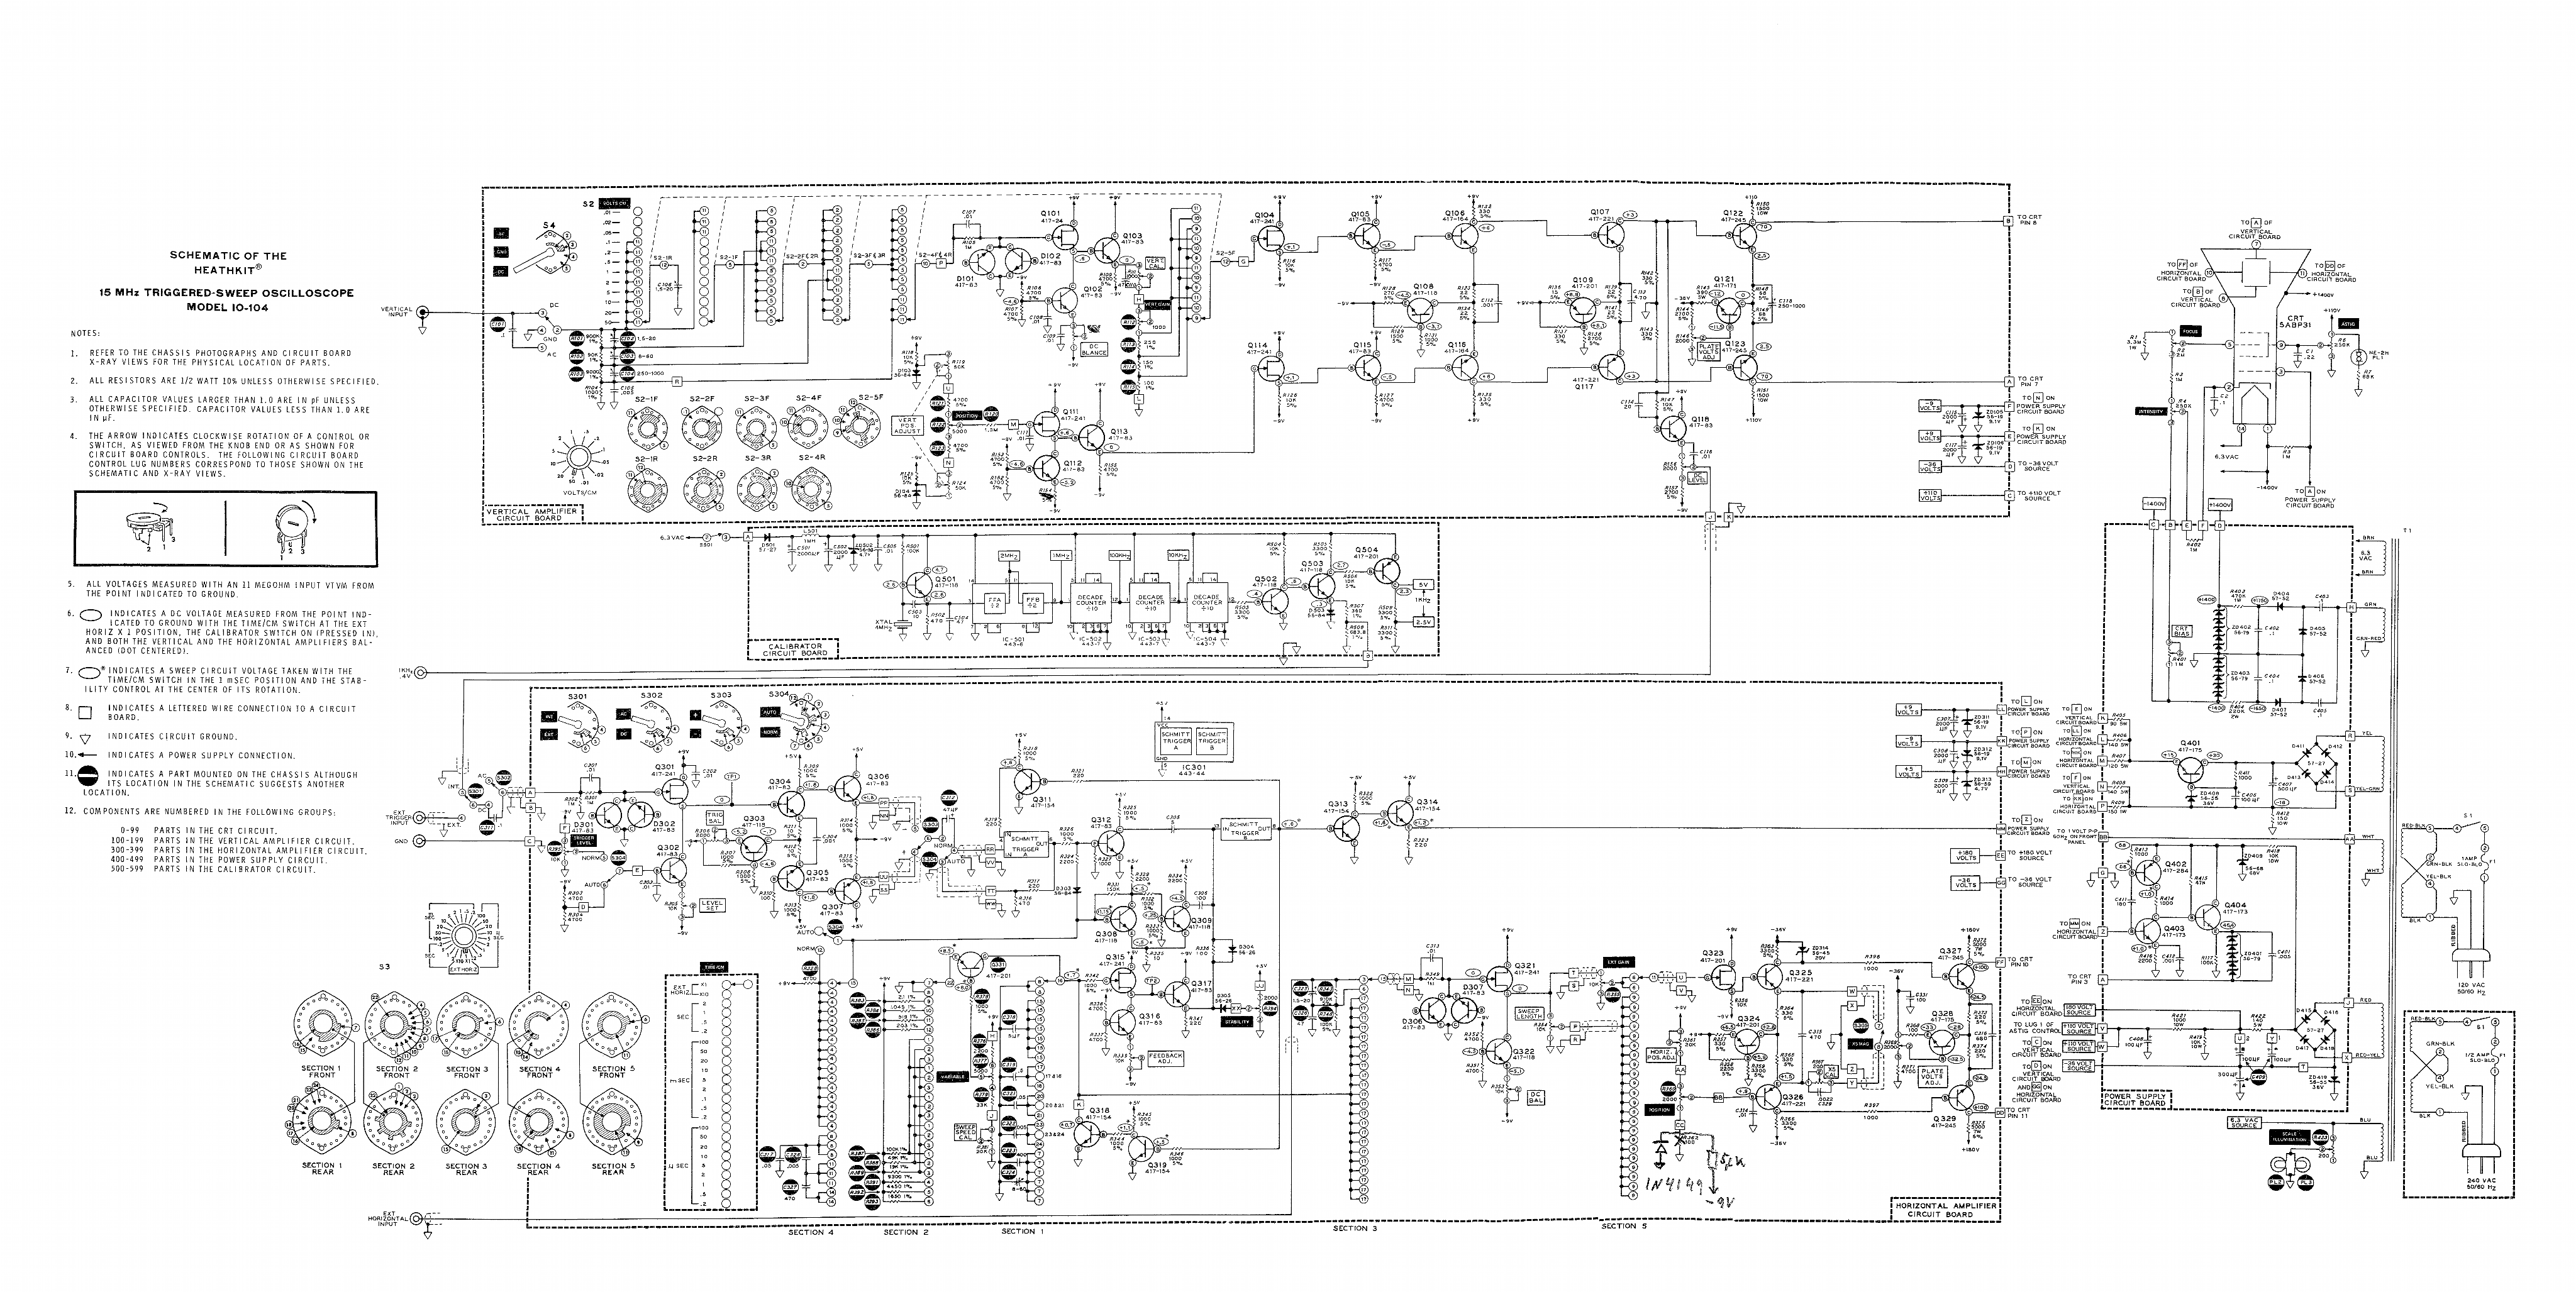 Garrett Metal Detector Schematic Bfo Circuit Heathkit Oscilloscope Get Free Image About